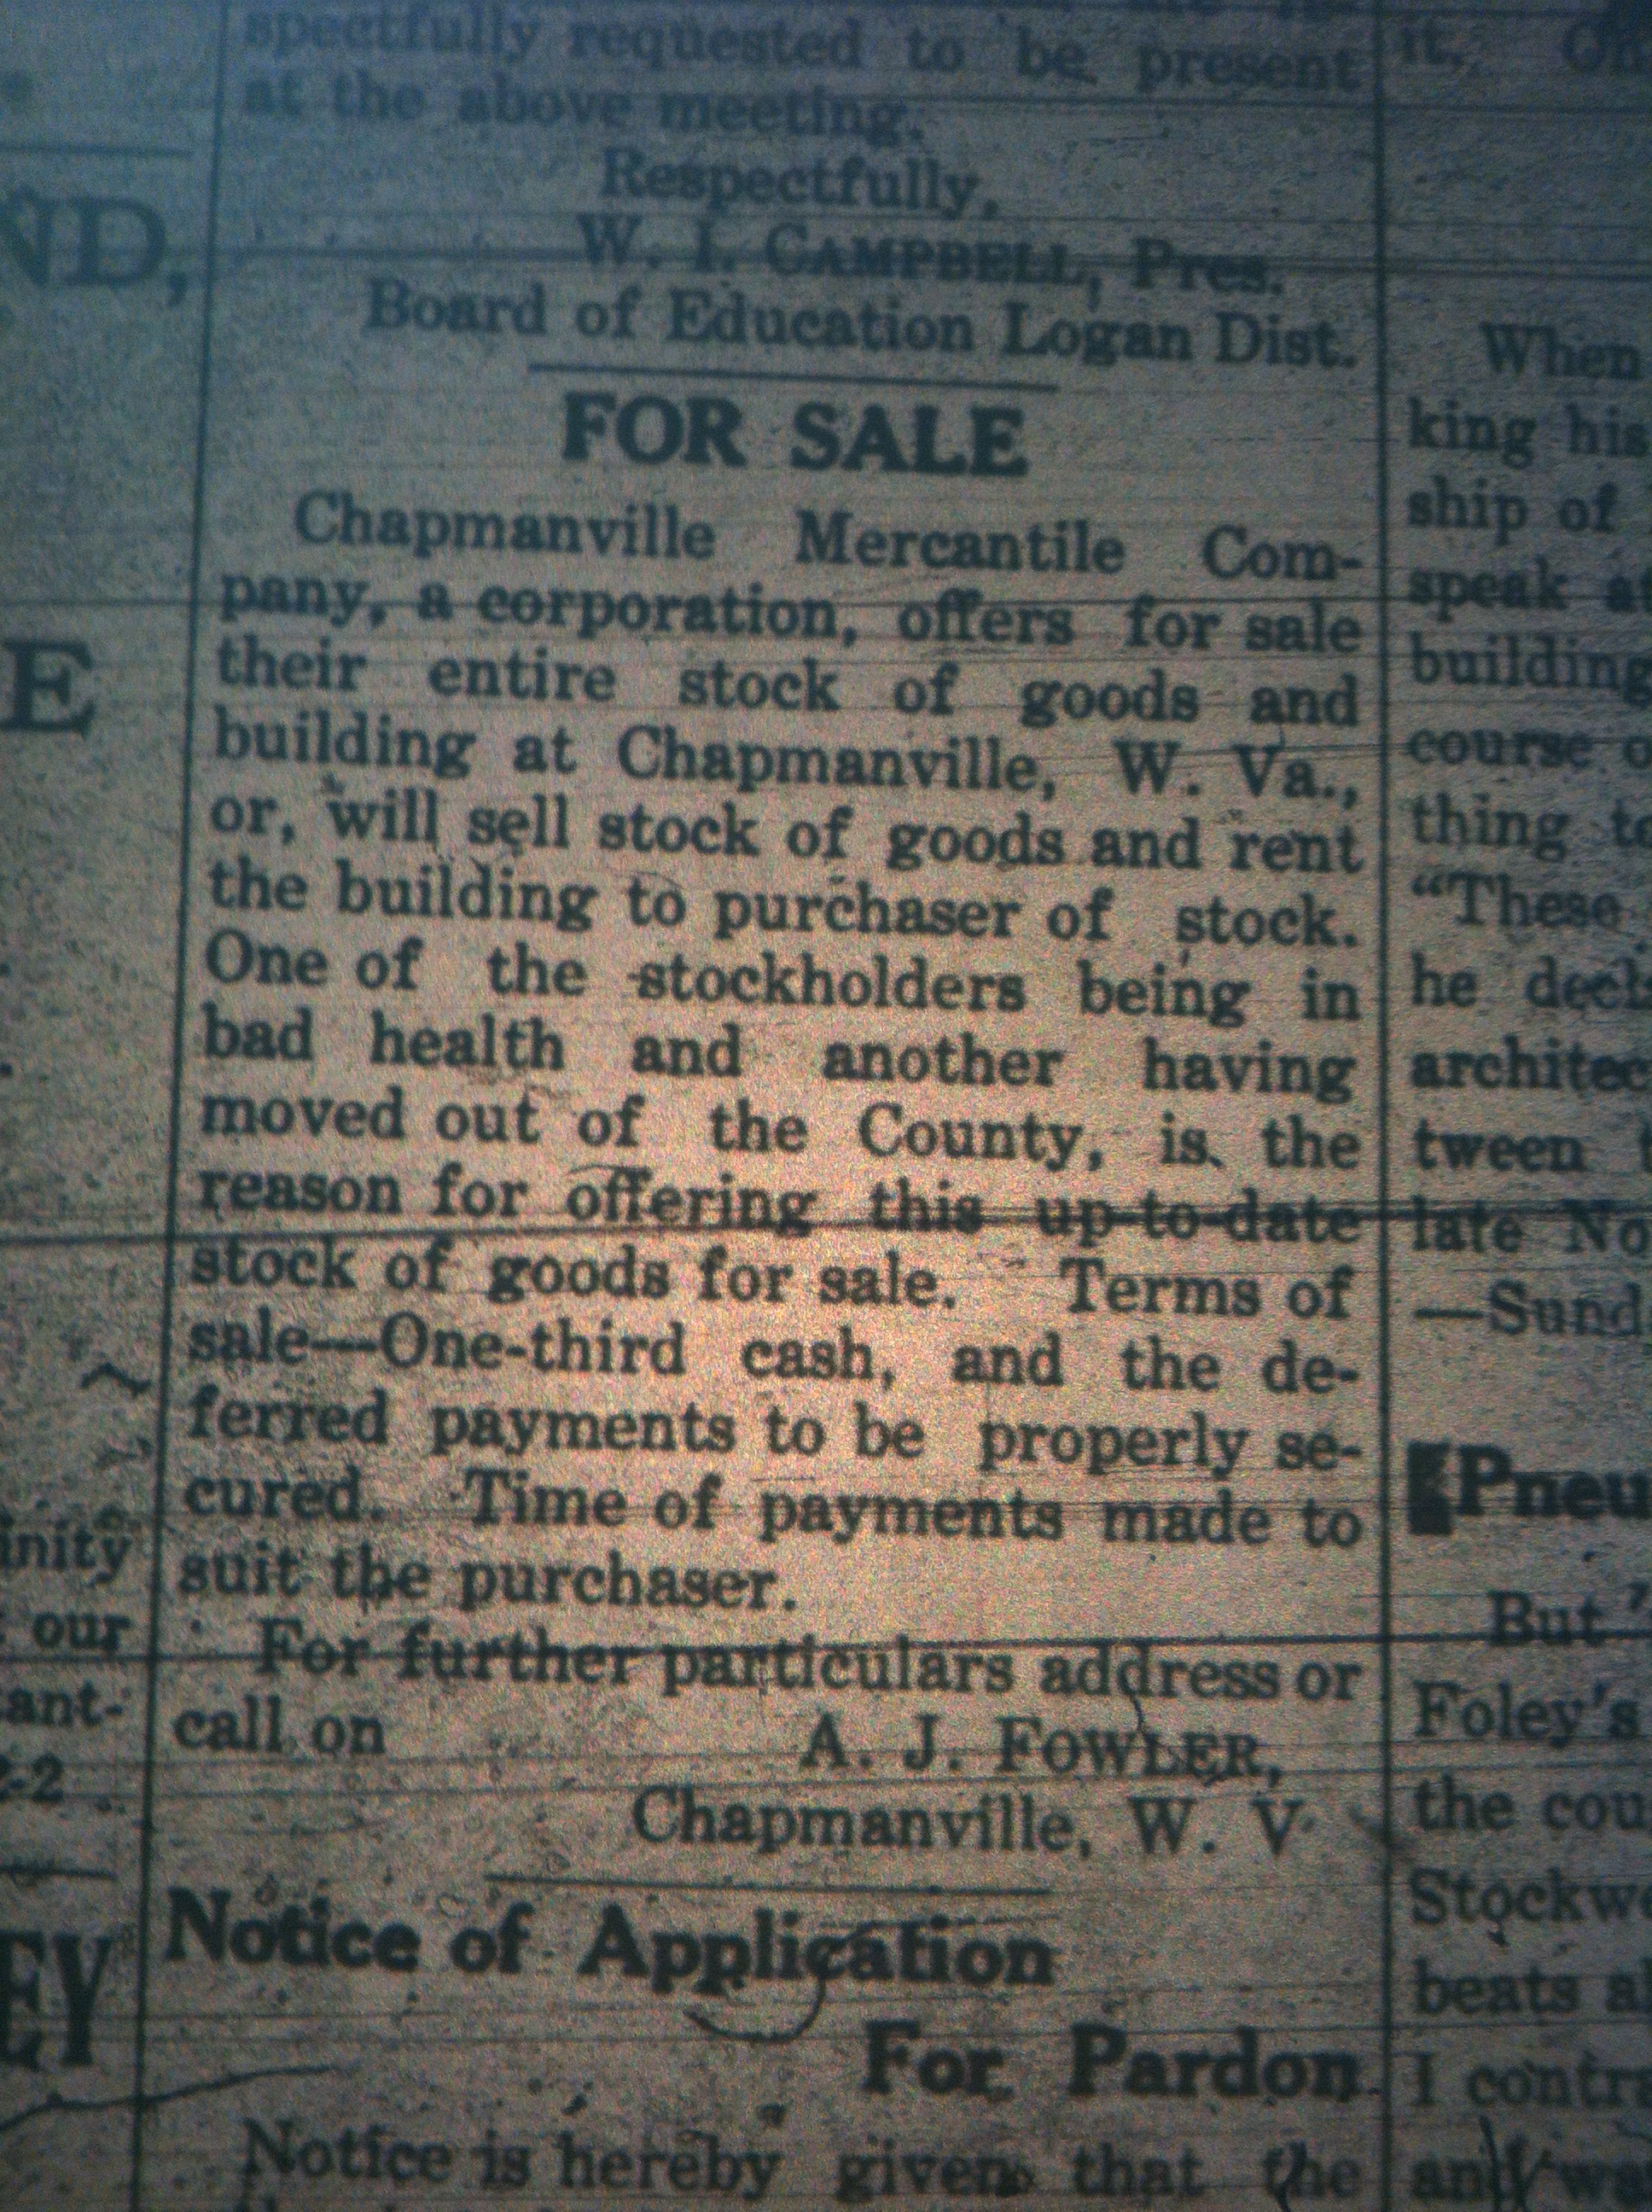 Chapmanville Mercantile Company Ad LD 02.09.1911.JPG